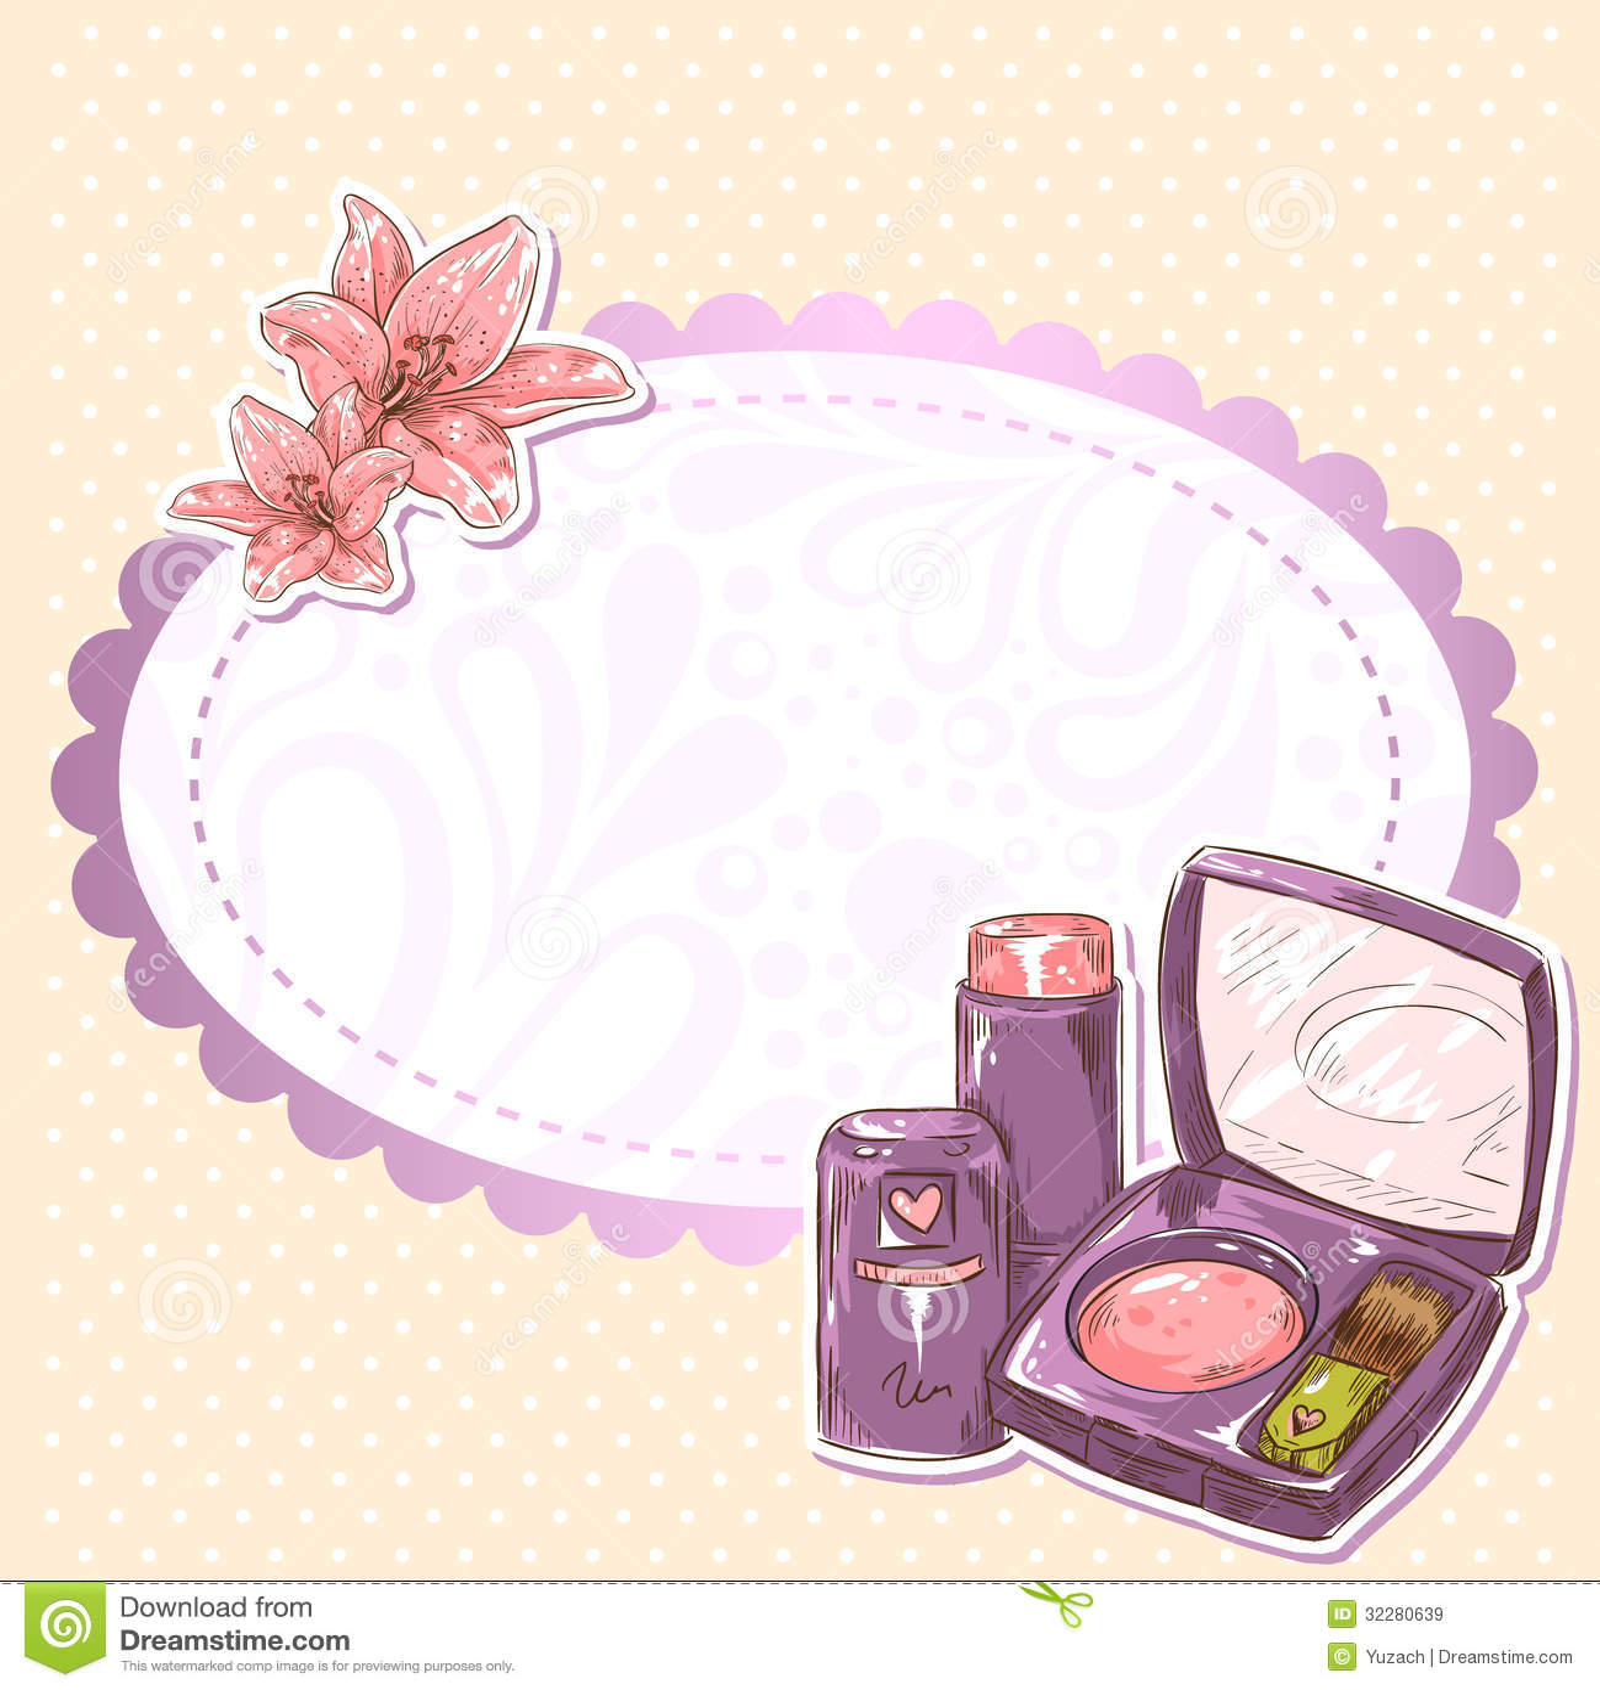 Skincare Make-up Blusher, Eye-shadow And Lipstick Royalty Free ...